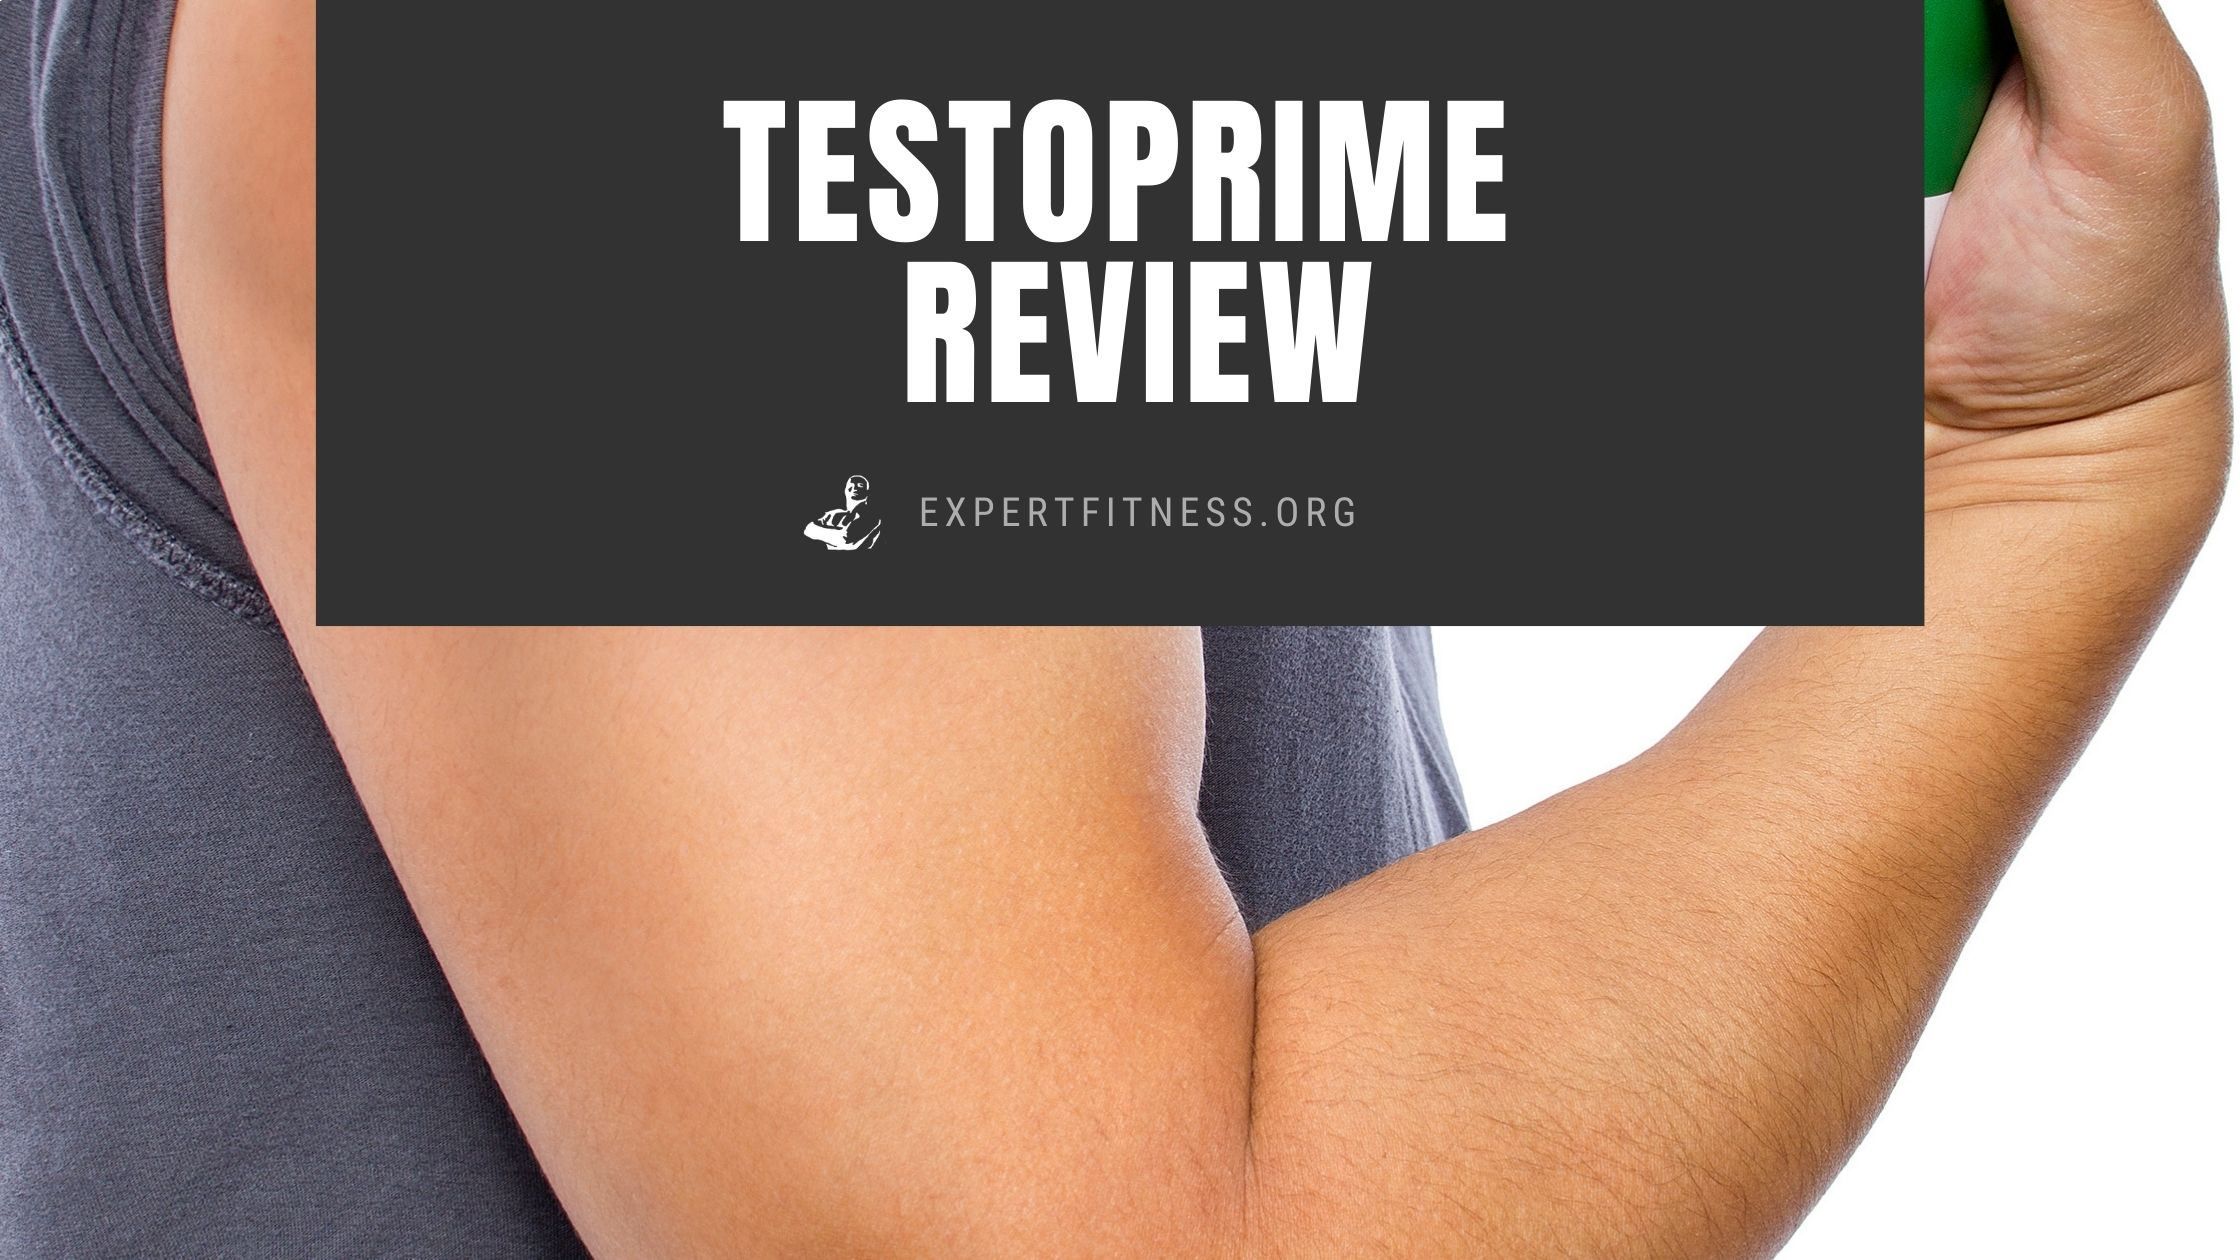 Testo Prime Review